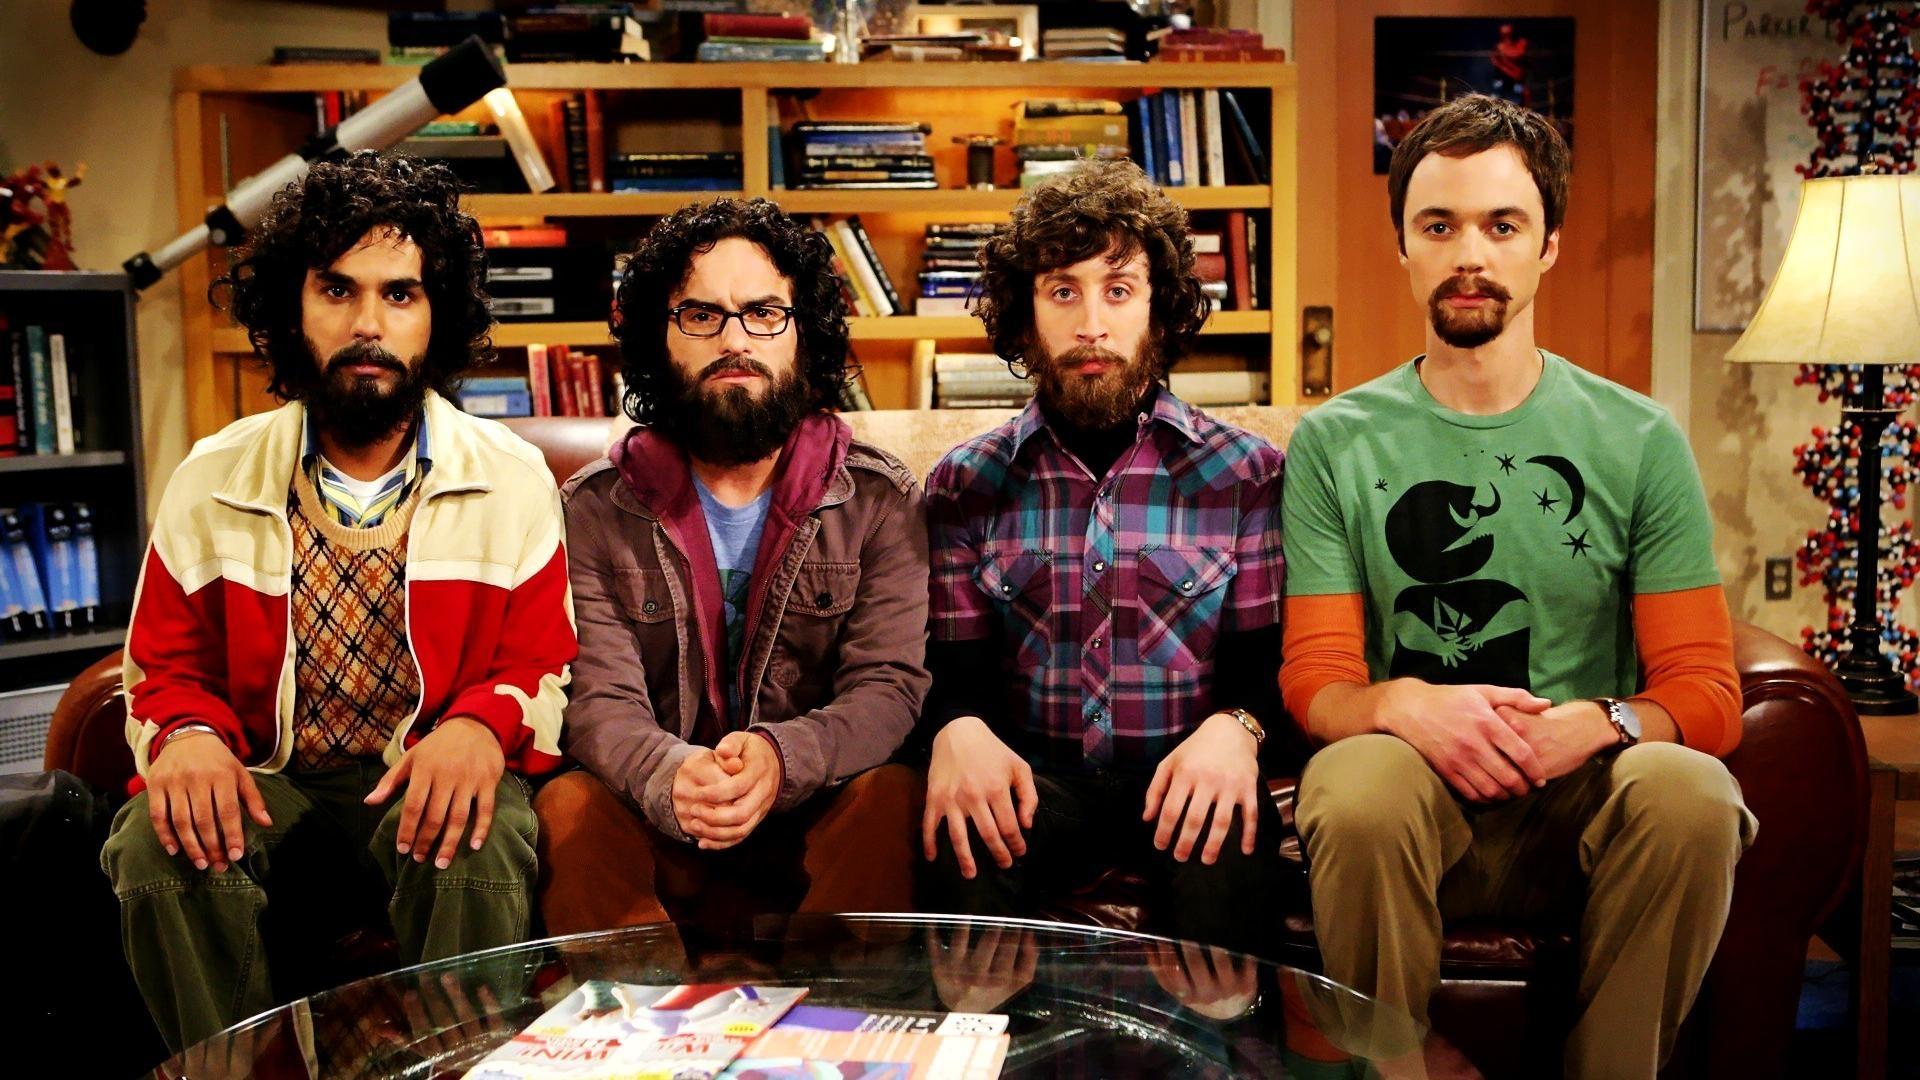 The GX94 Morning Show and the Big Bang Theory